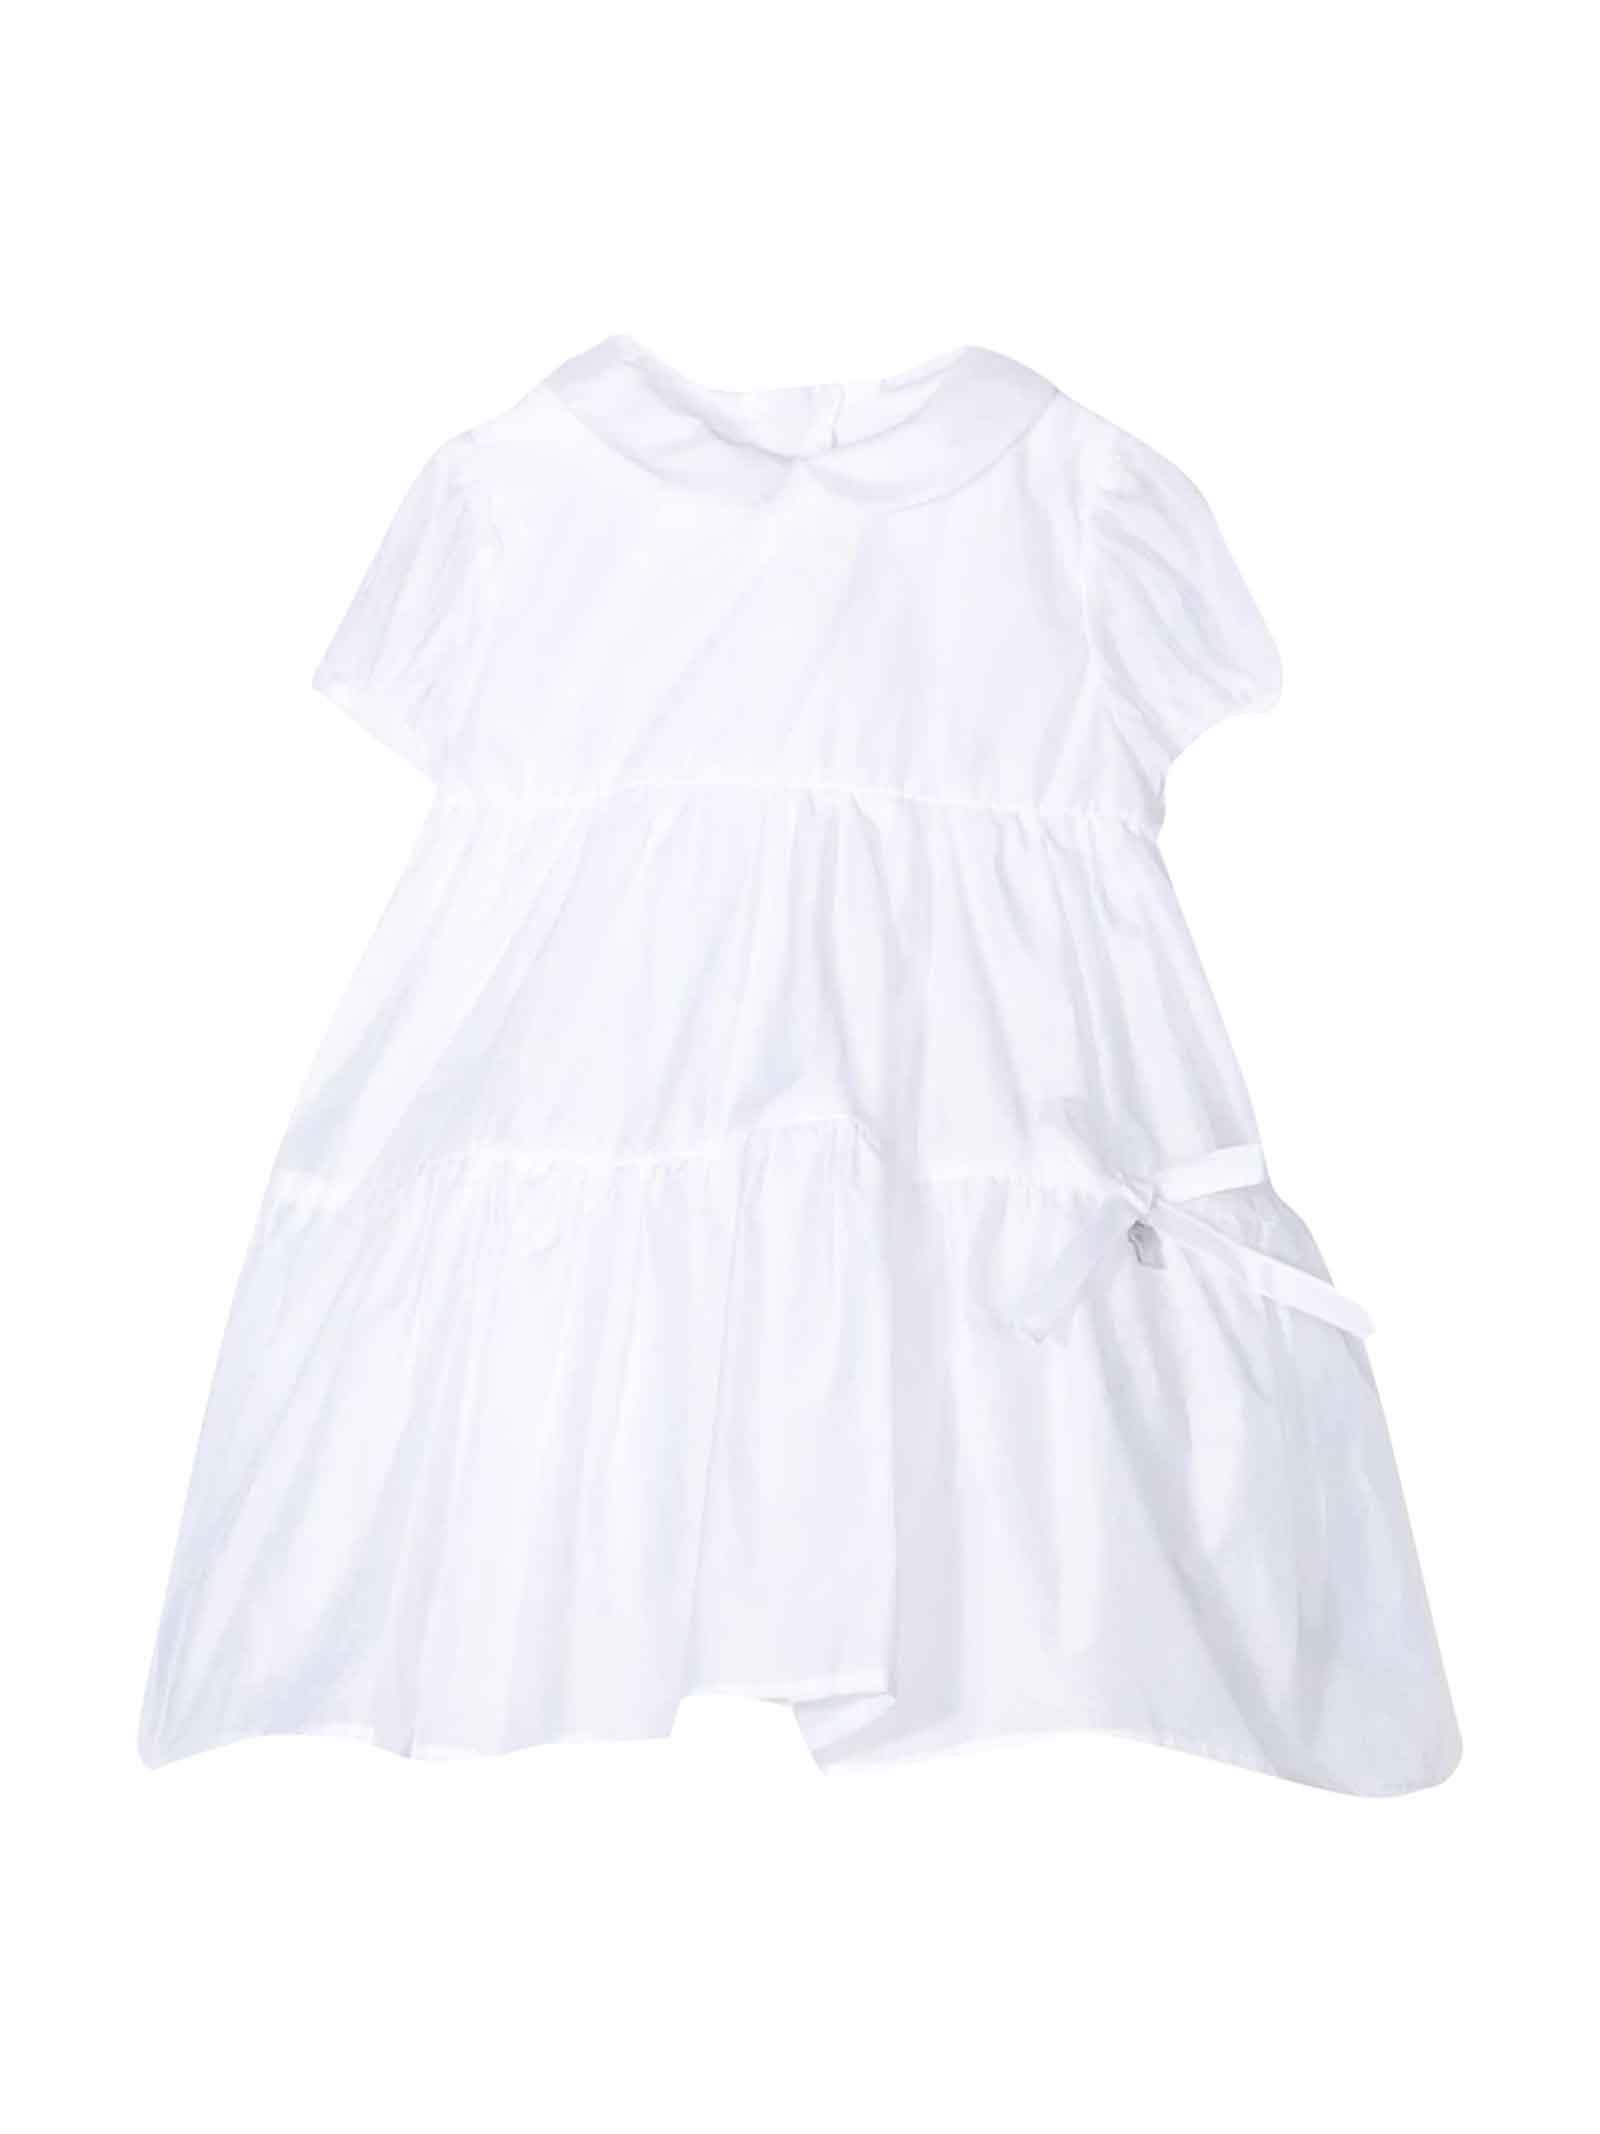 Buy Simonetta White Dress Kids online, shop Simonetta with free shipping